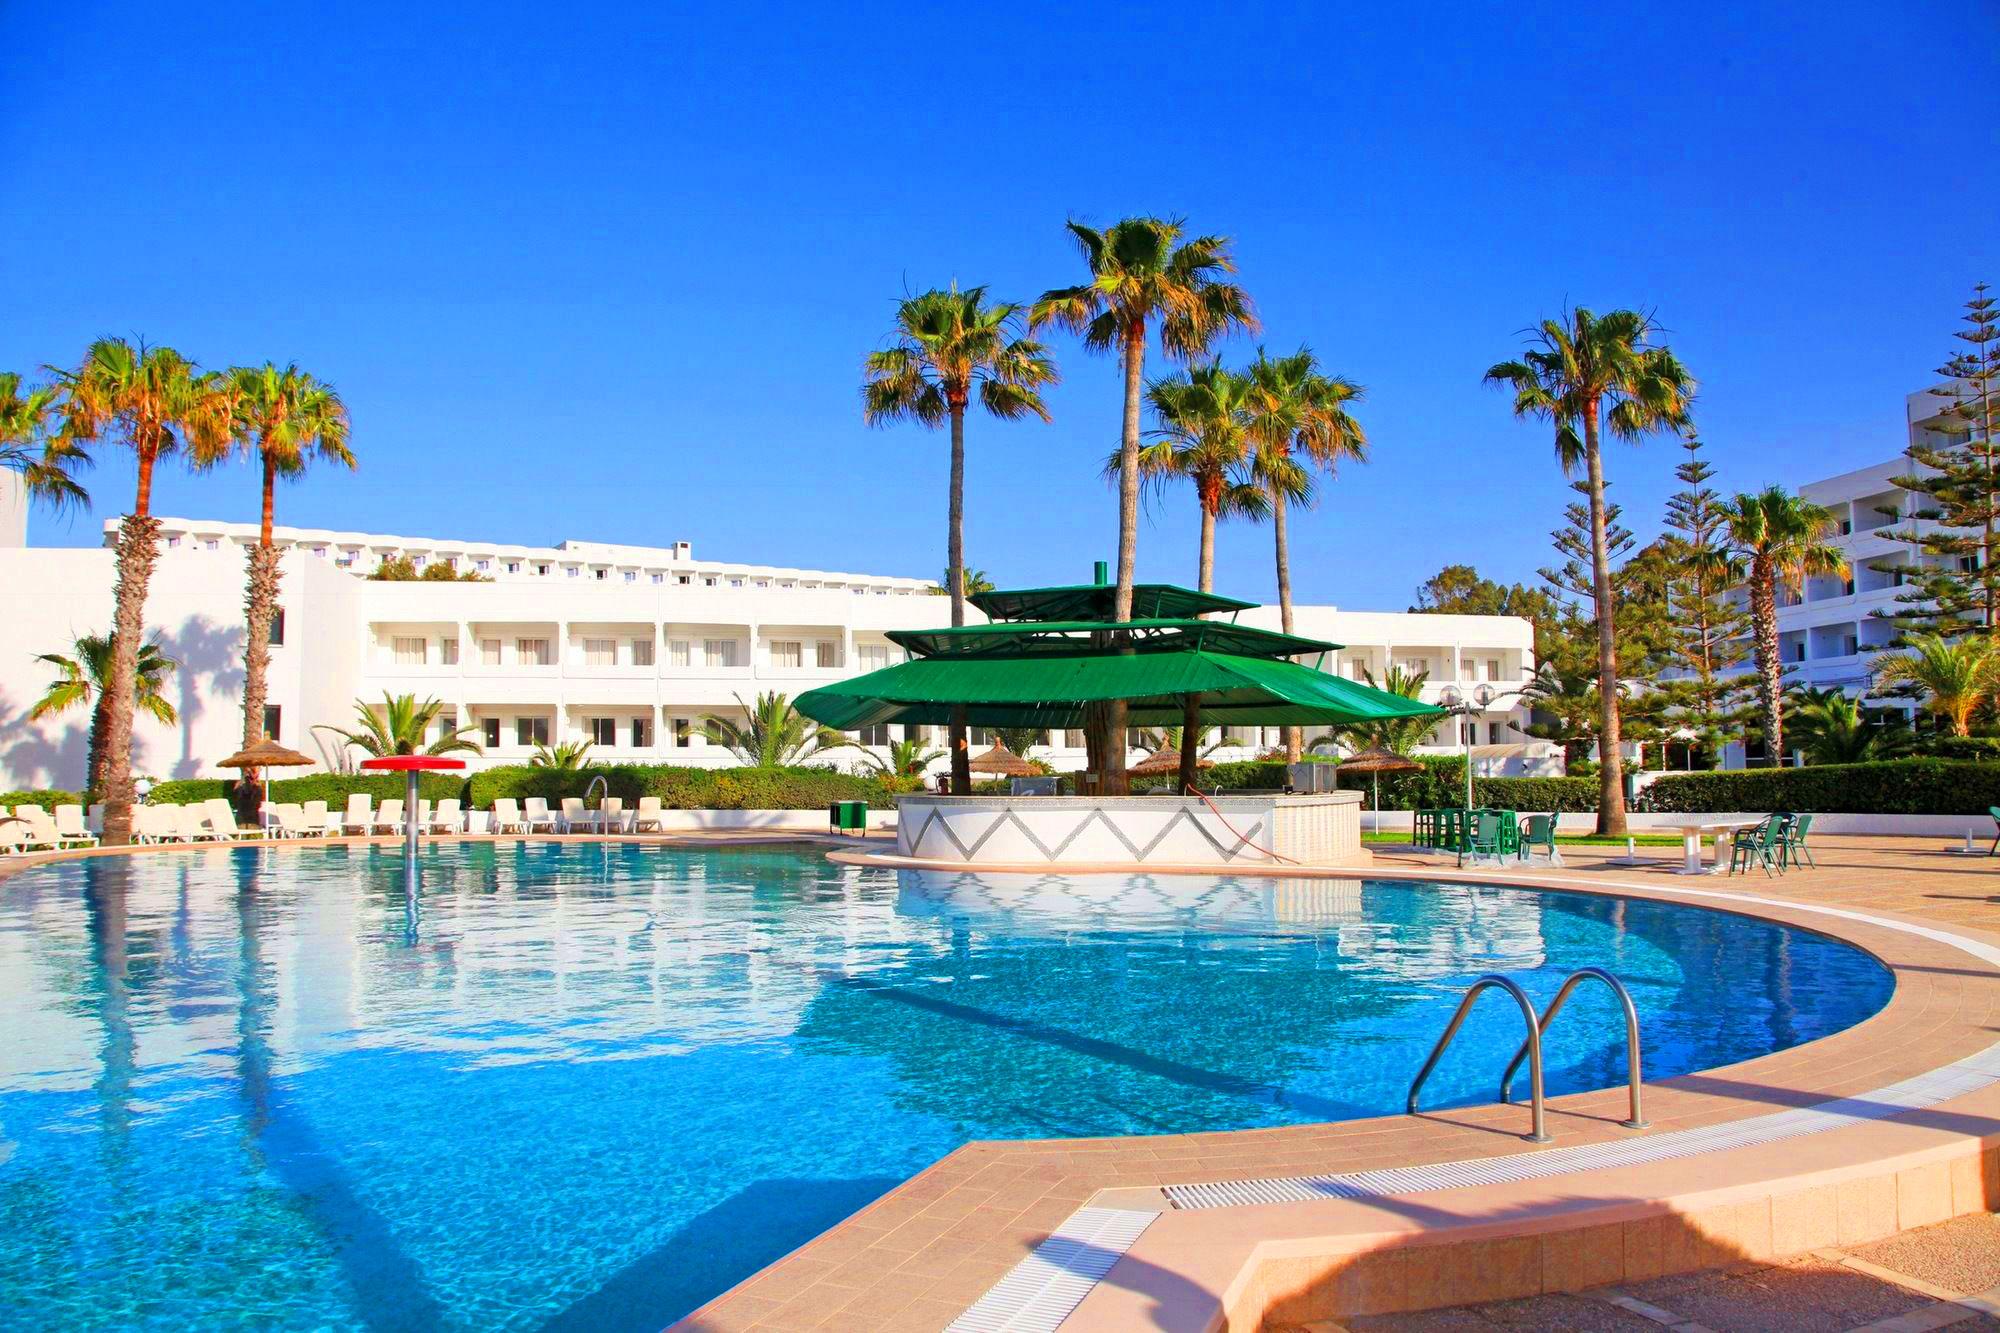 Hotel Tropicana Club & Spa - Tunisia